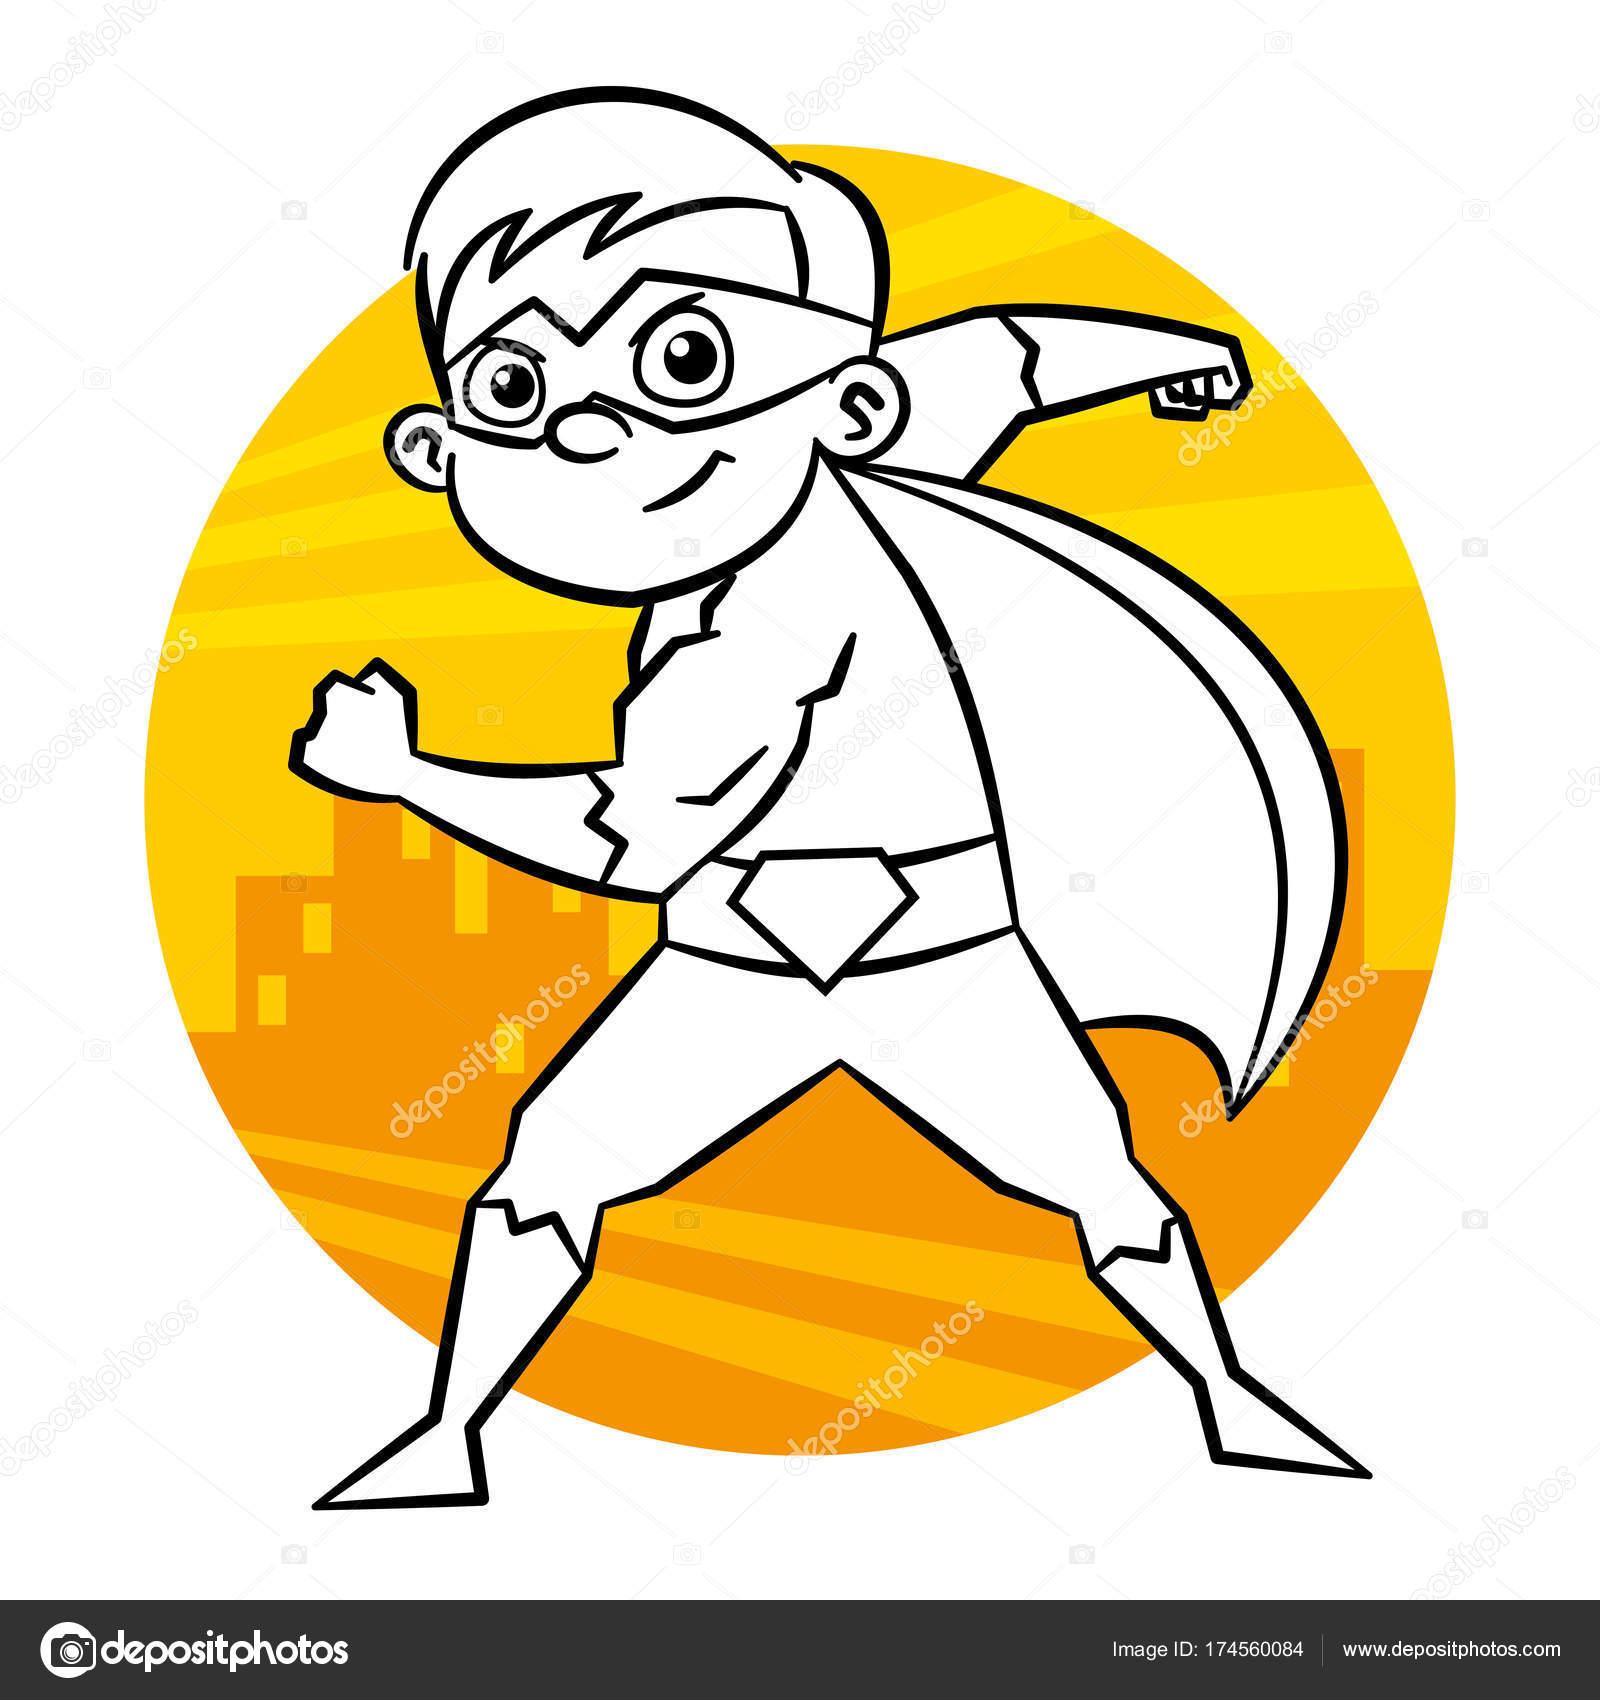 Malvorlagen Superhelden — Stockvektor © ichbinsam #174560084